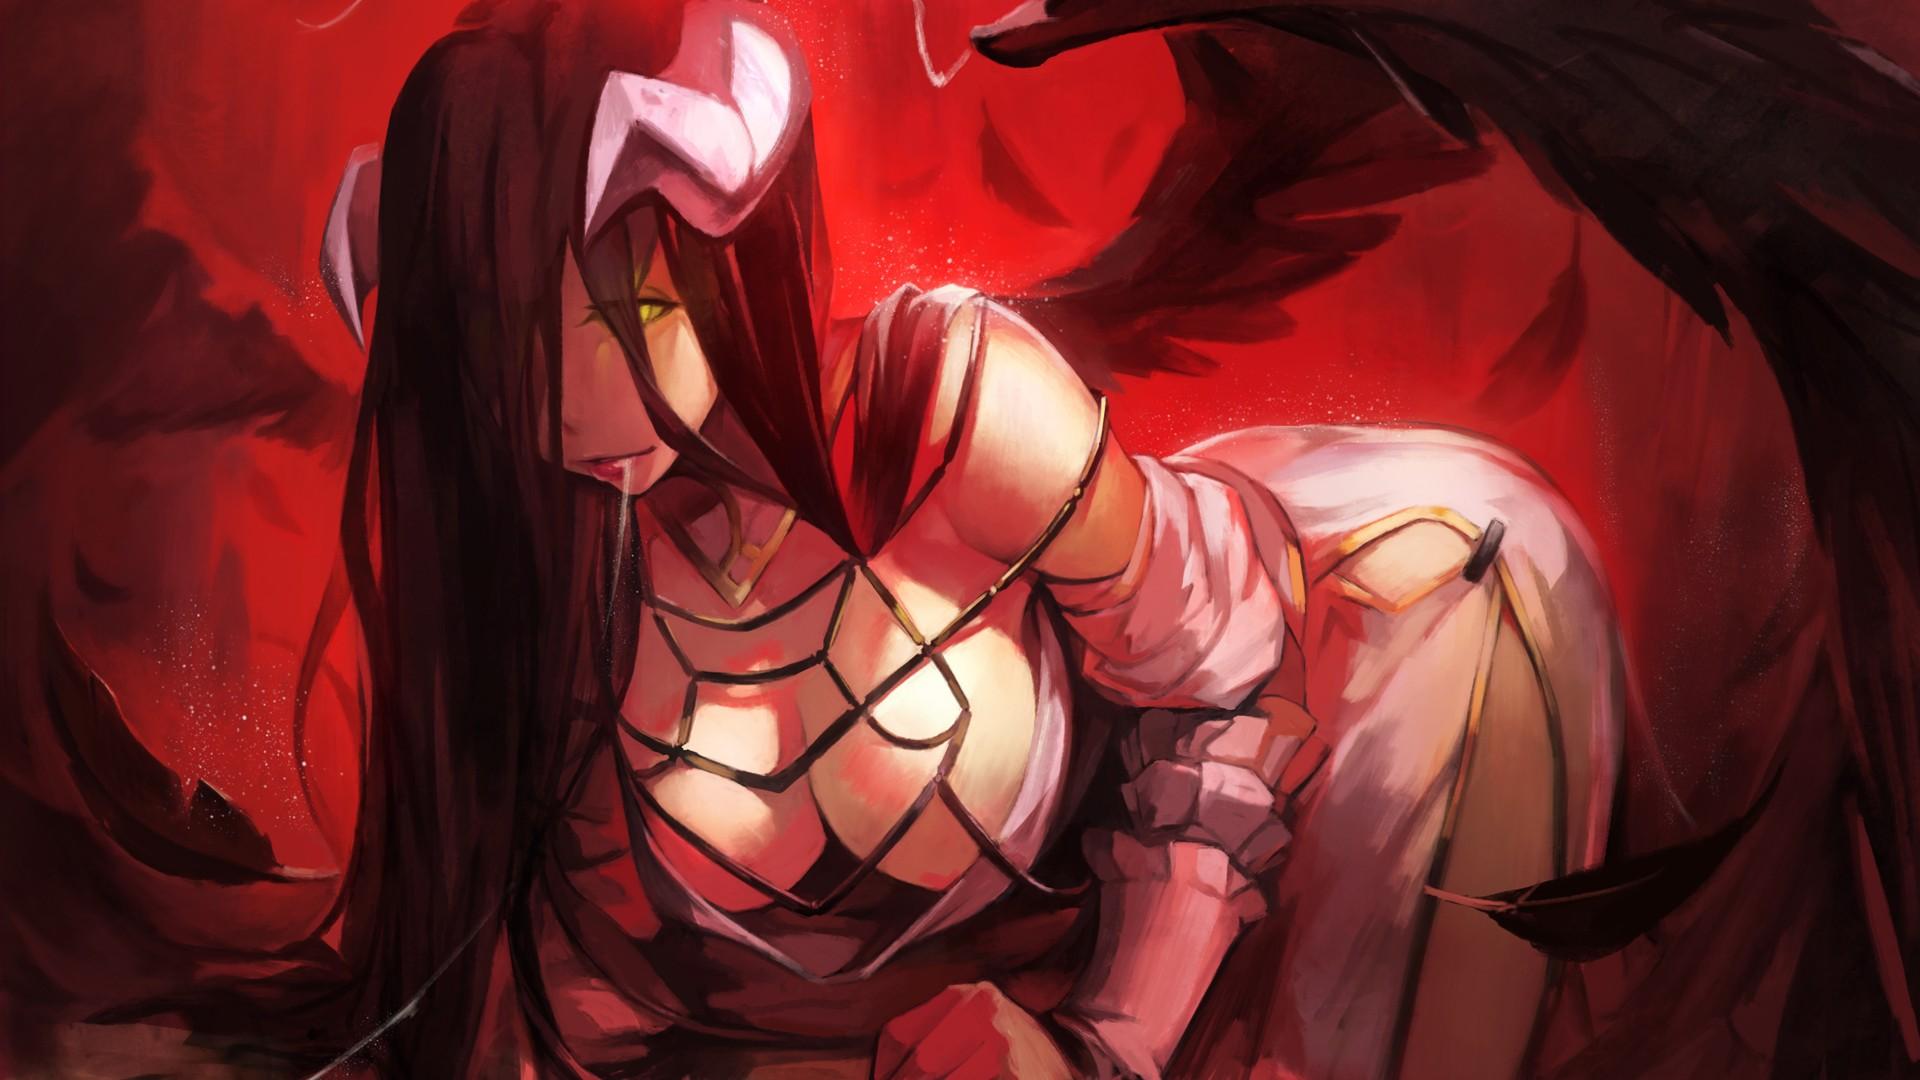 Anime 1920x1080 Albedo (OverLord) anime anime girls horns Overlord (anime) drool red demon girl